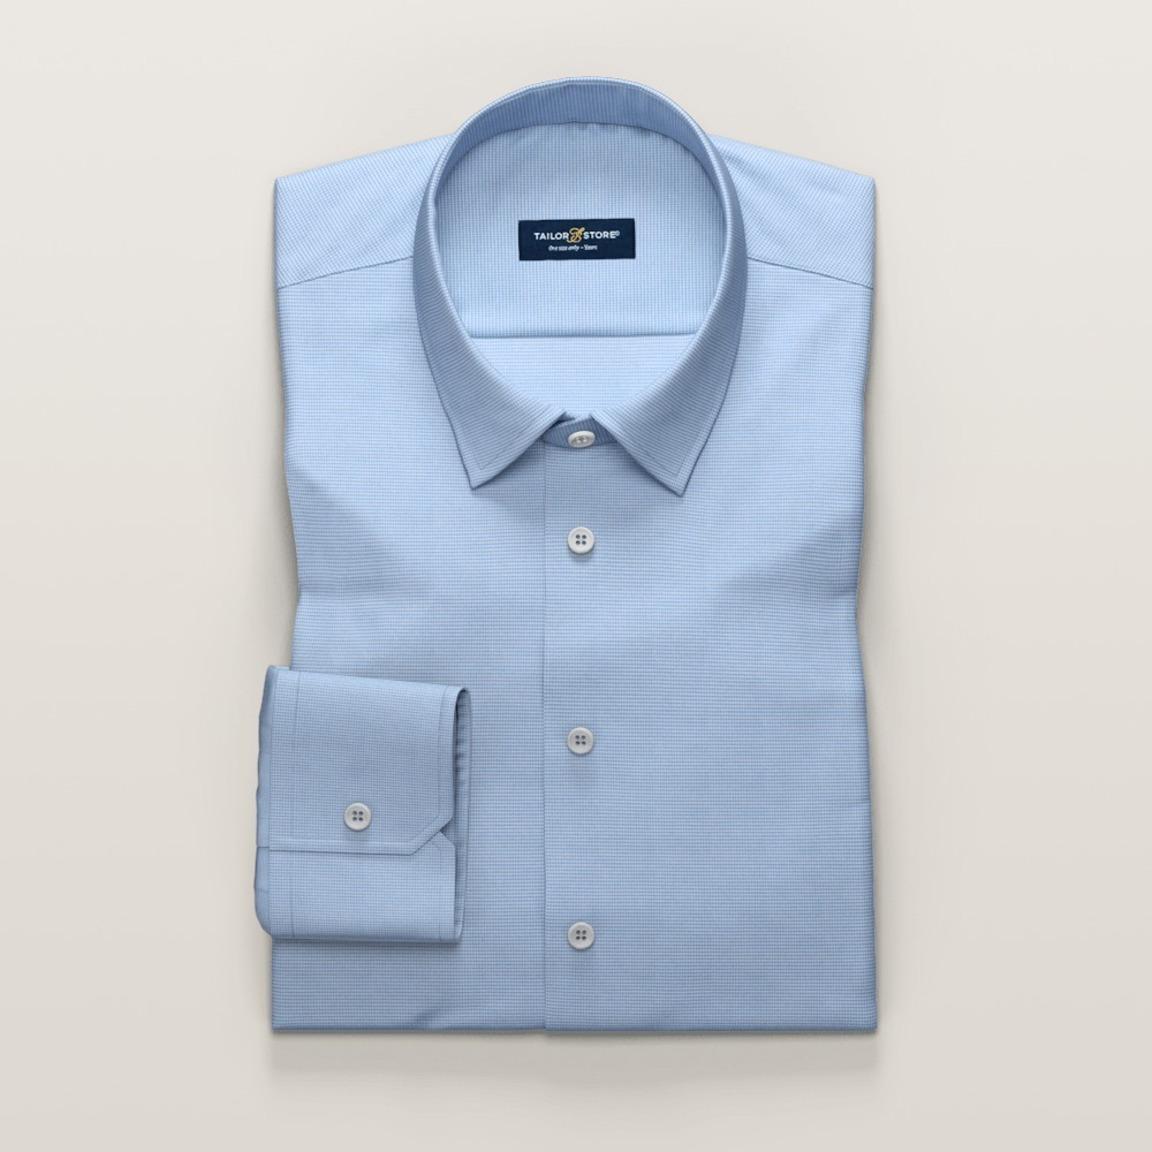 Alpha M - Business shirt in light blue dogtooth weave